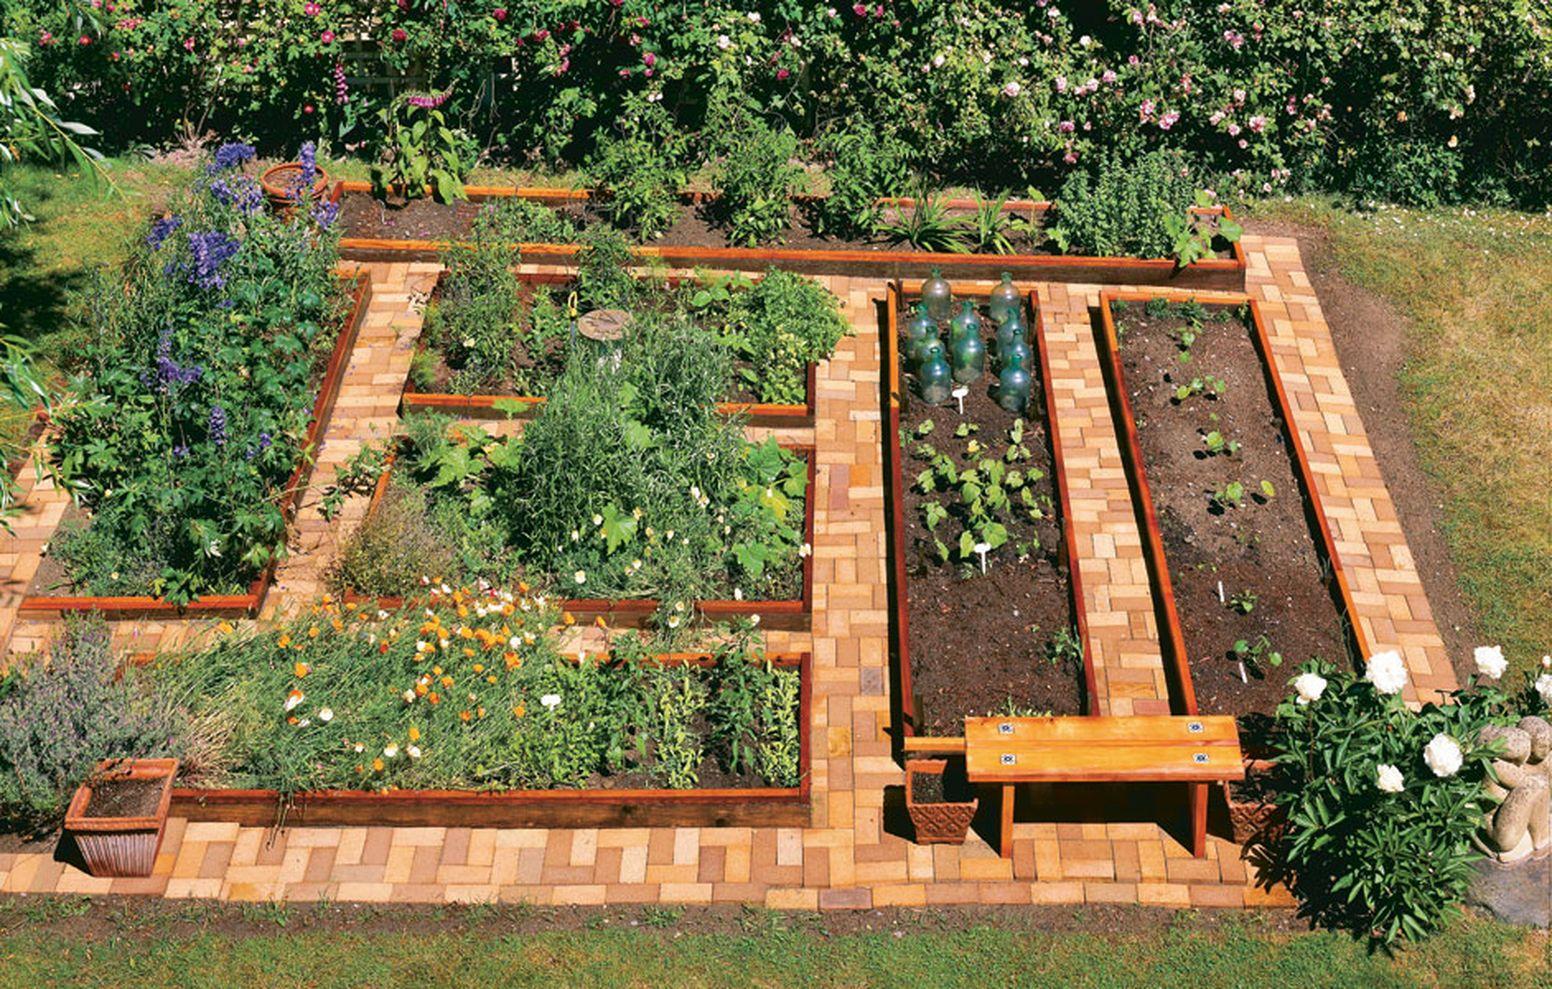 62 Affordable Backyard Vegetable Garden Designs Ideas ... on Vegetable Garden Ideas For Backyard id=19023